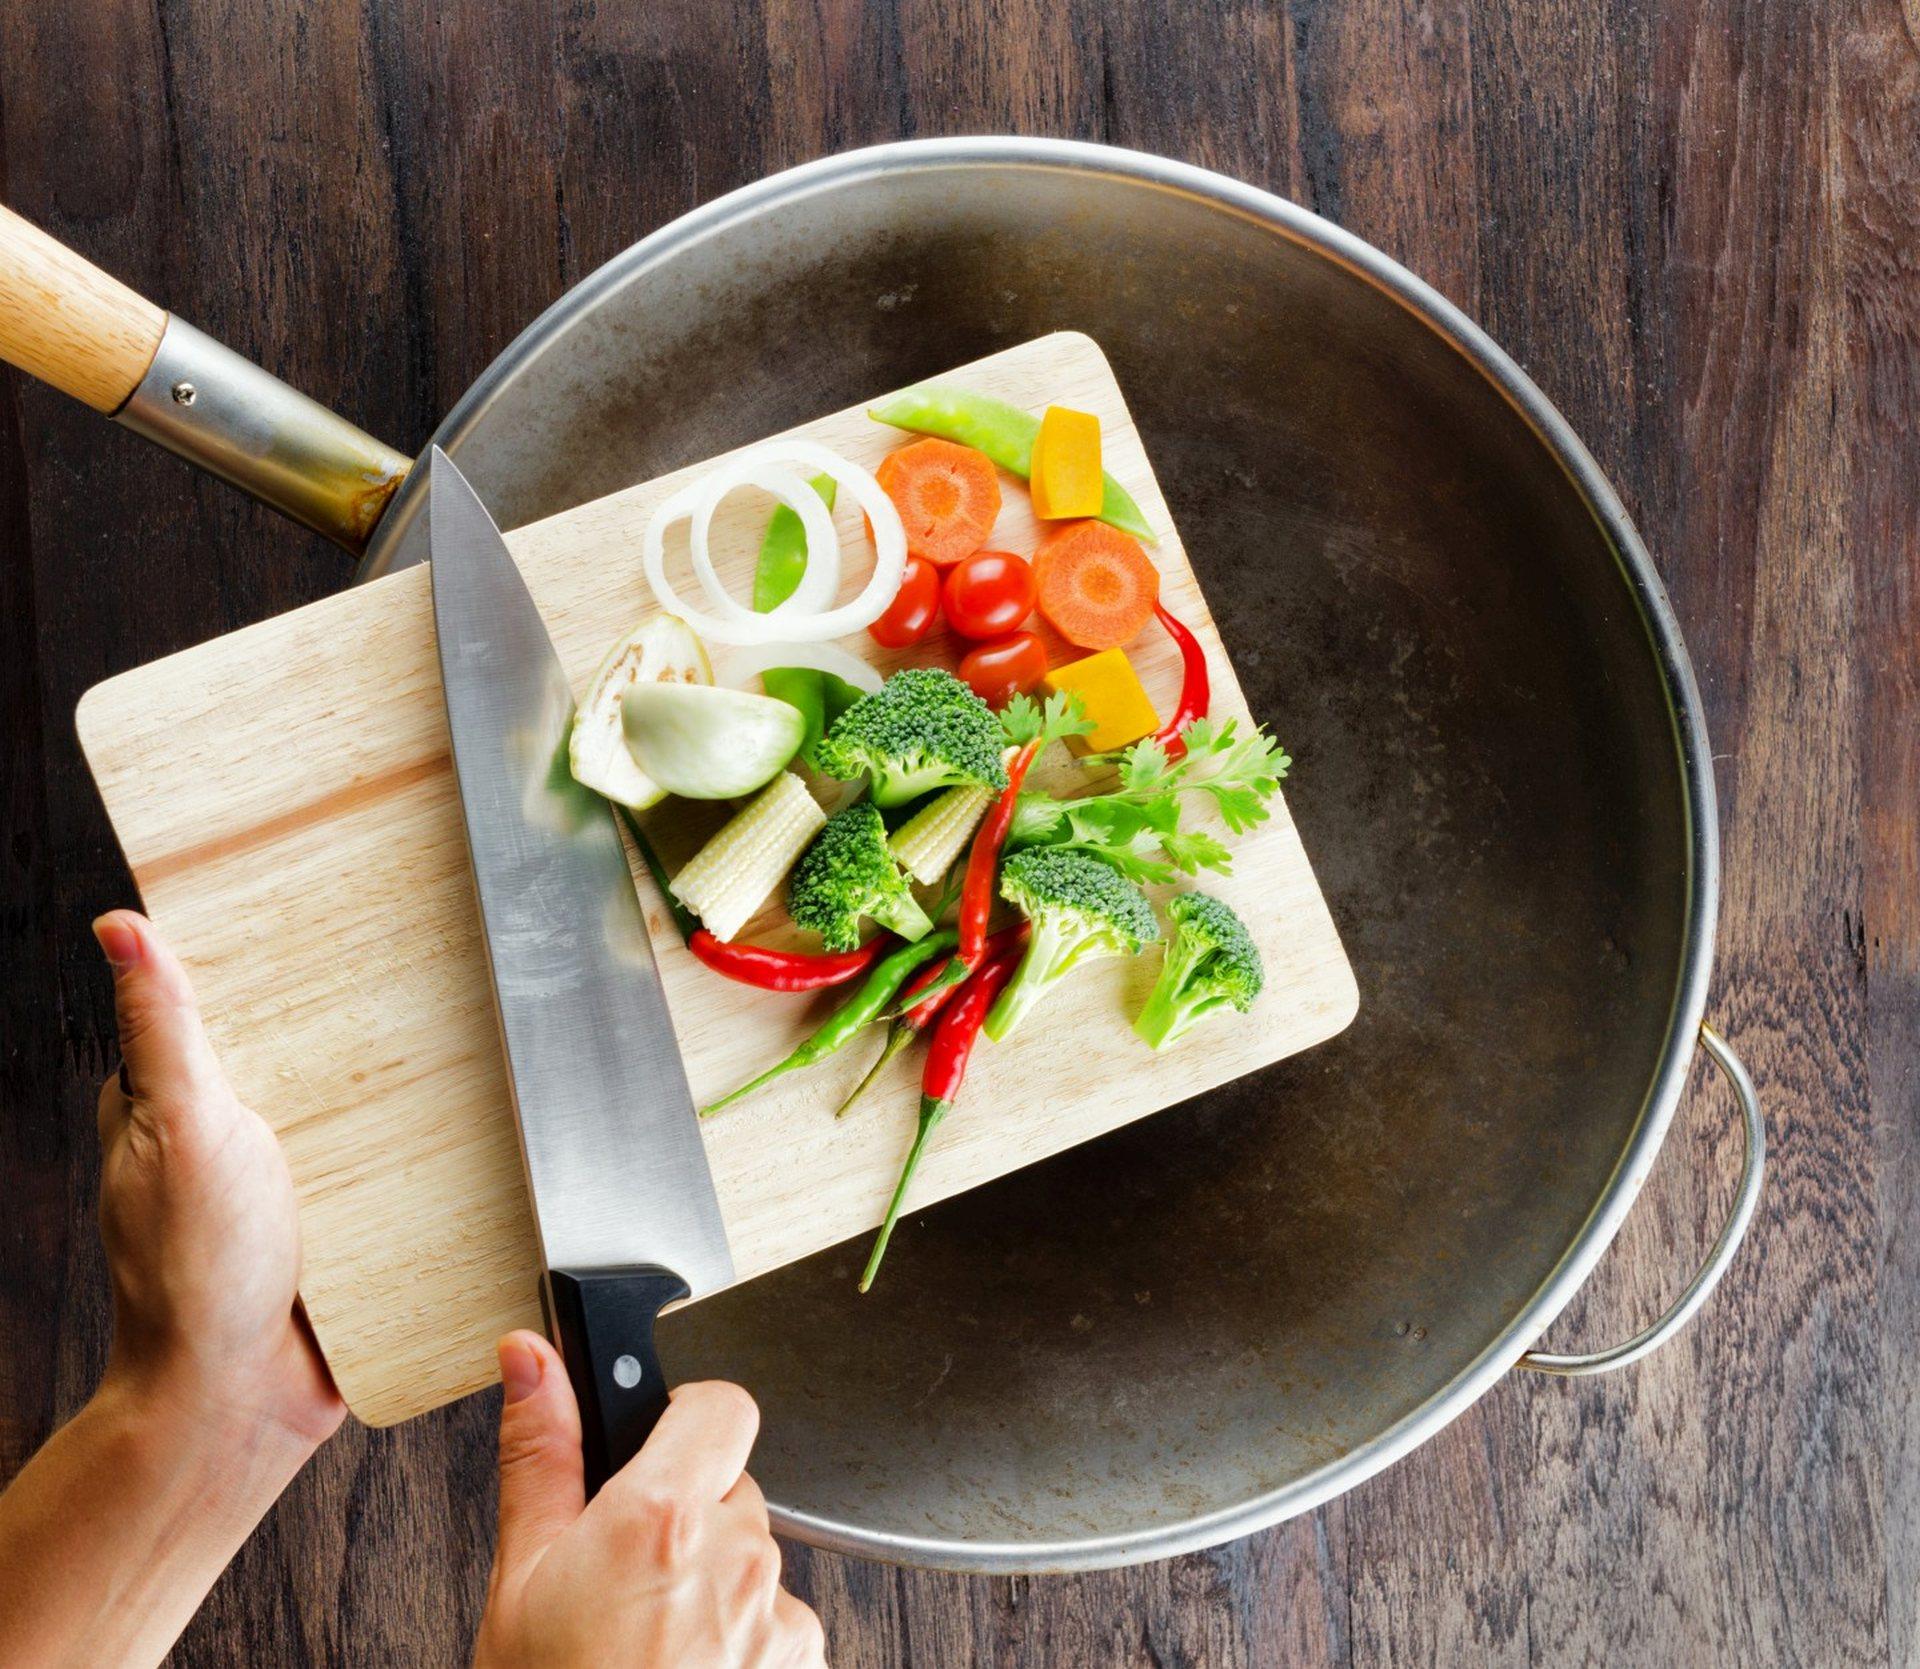 Niskokaloryczna I Szybka Dieta Hiszpanska Dieta Pl